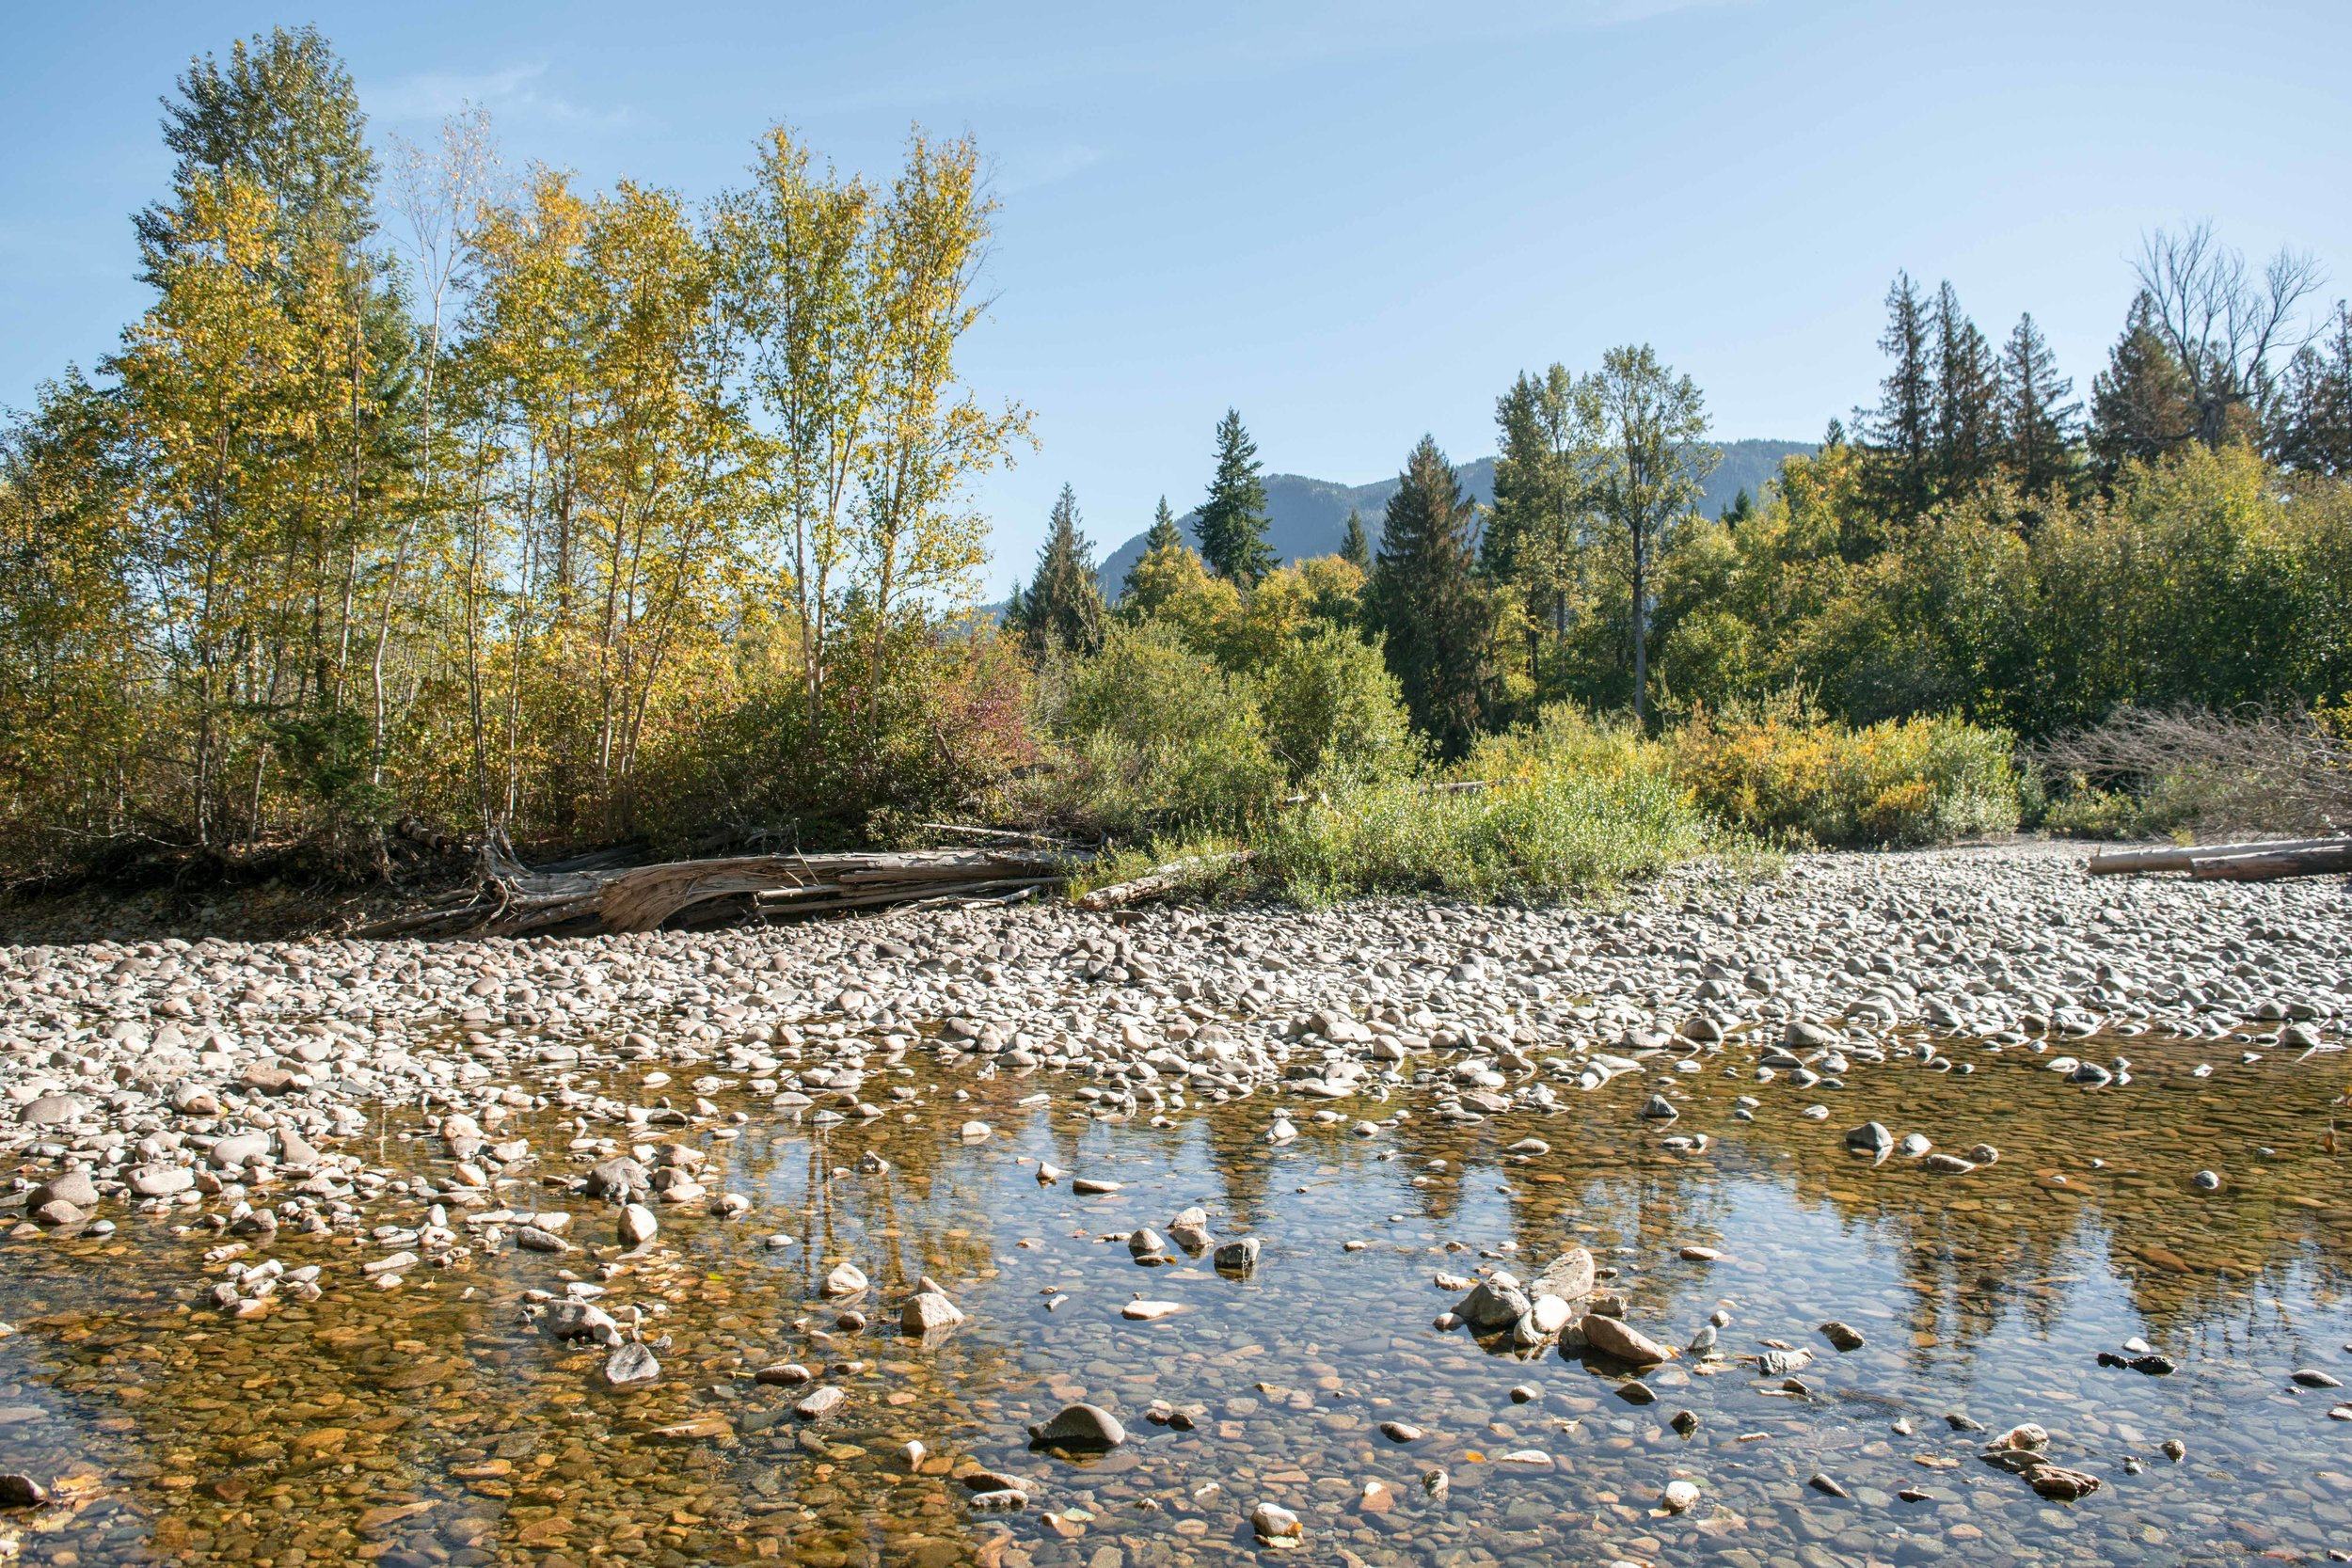 Adams River, Shuswap